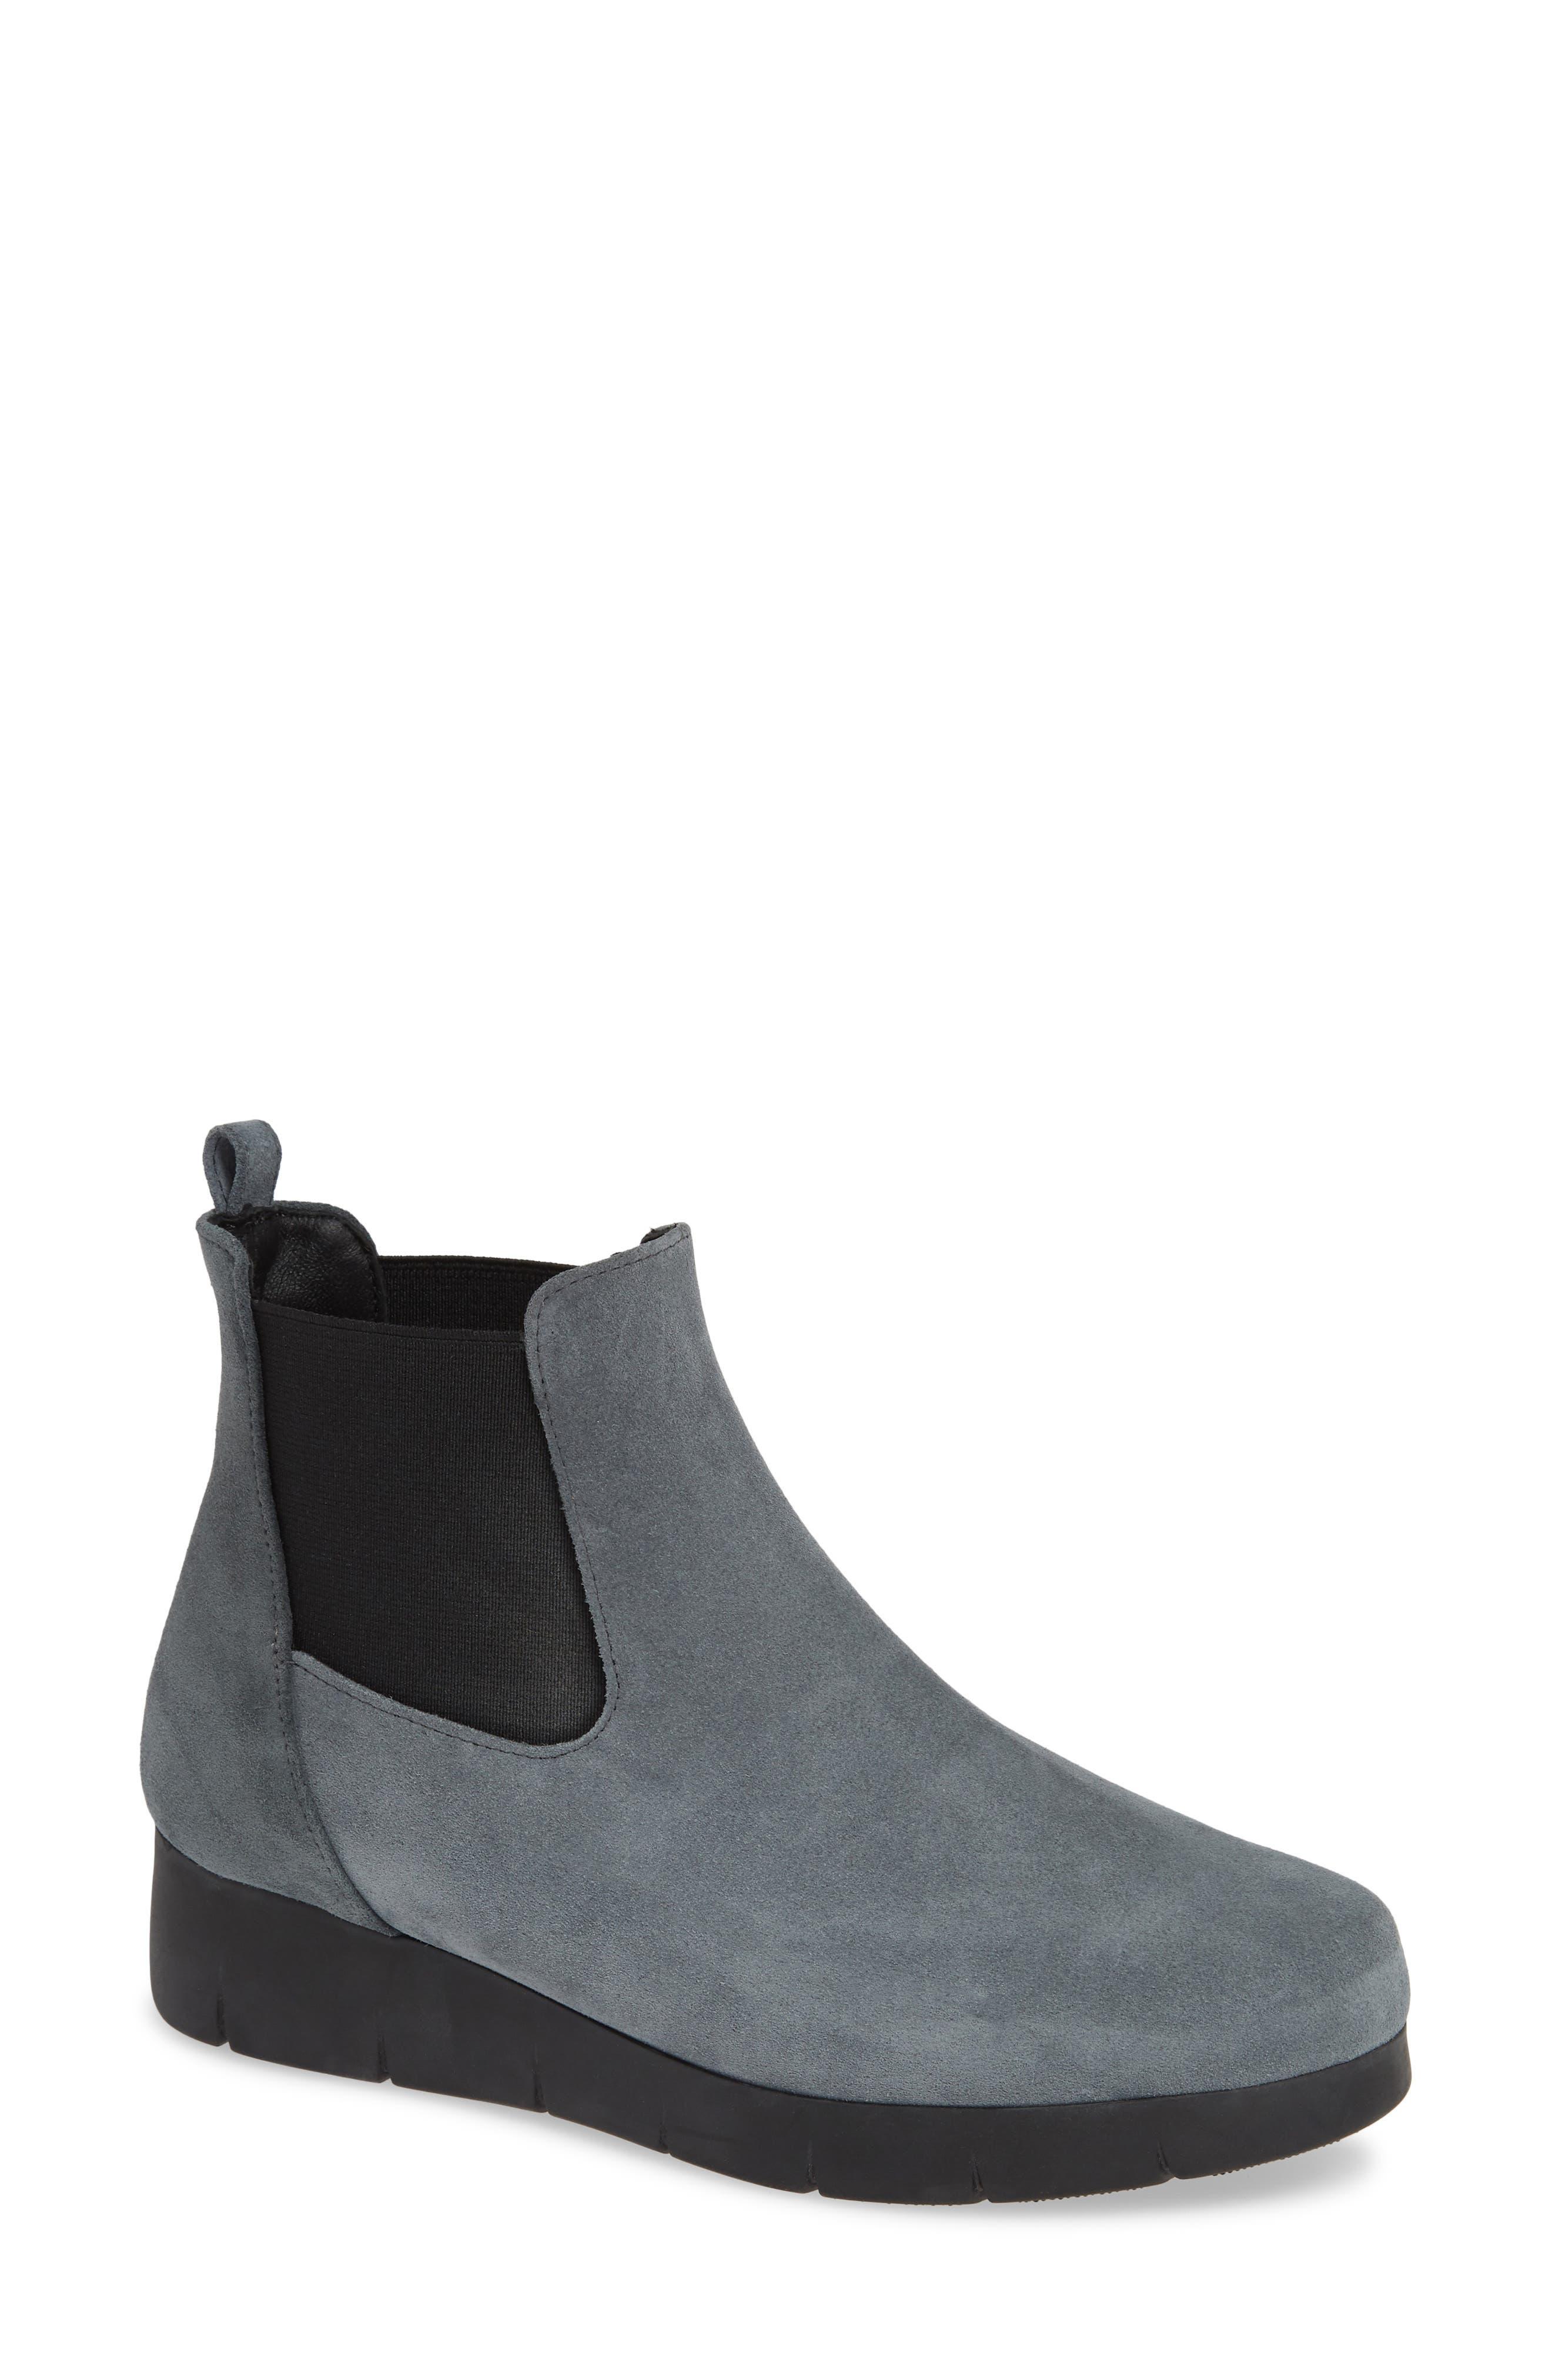 Cordani Aimee Water Resistant Chelsea Bootie - Grey